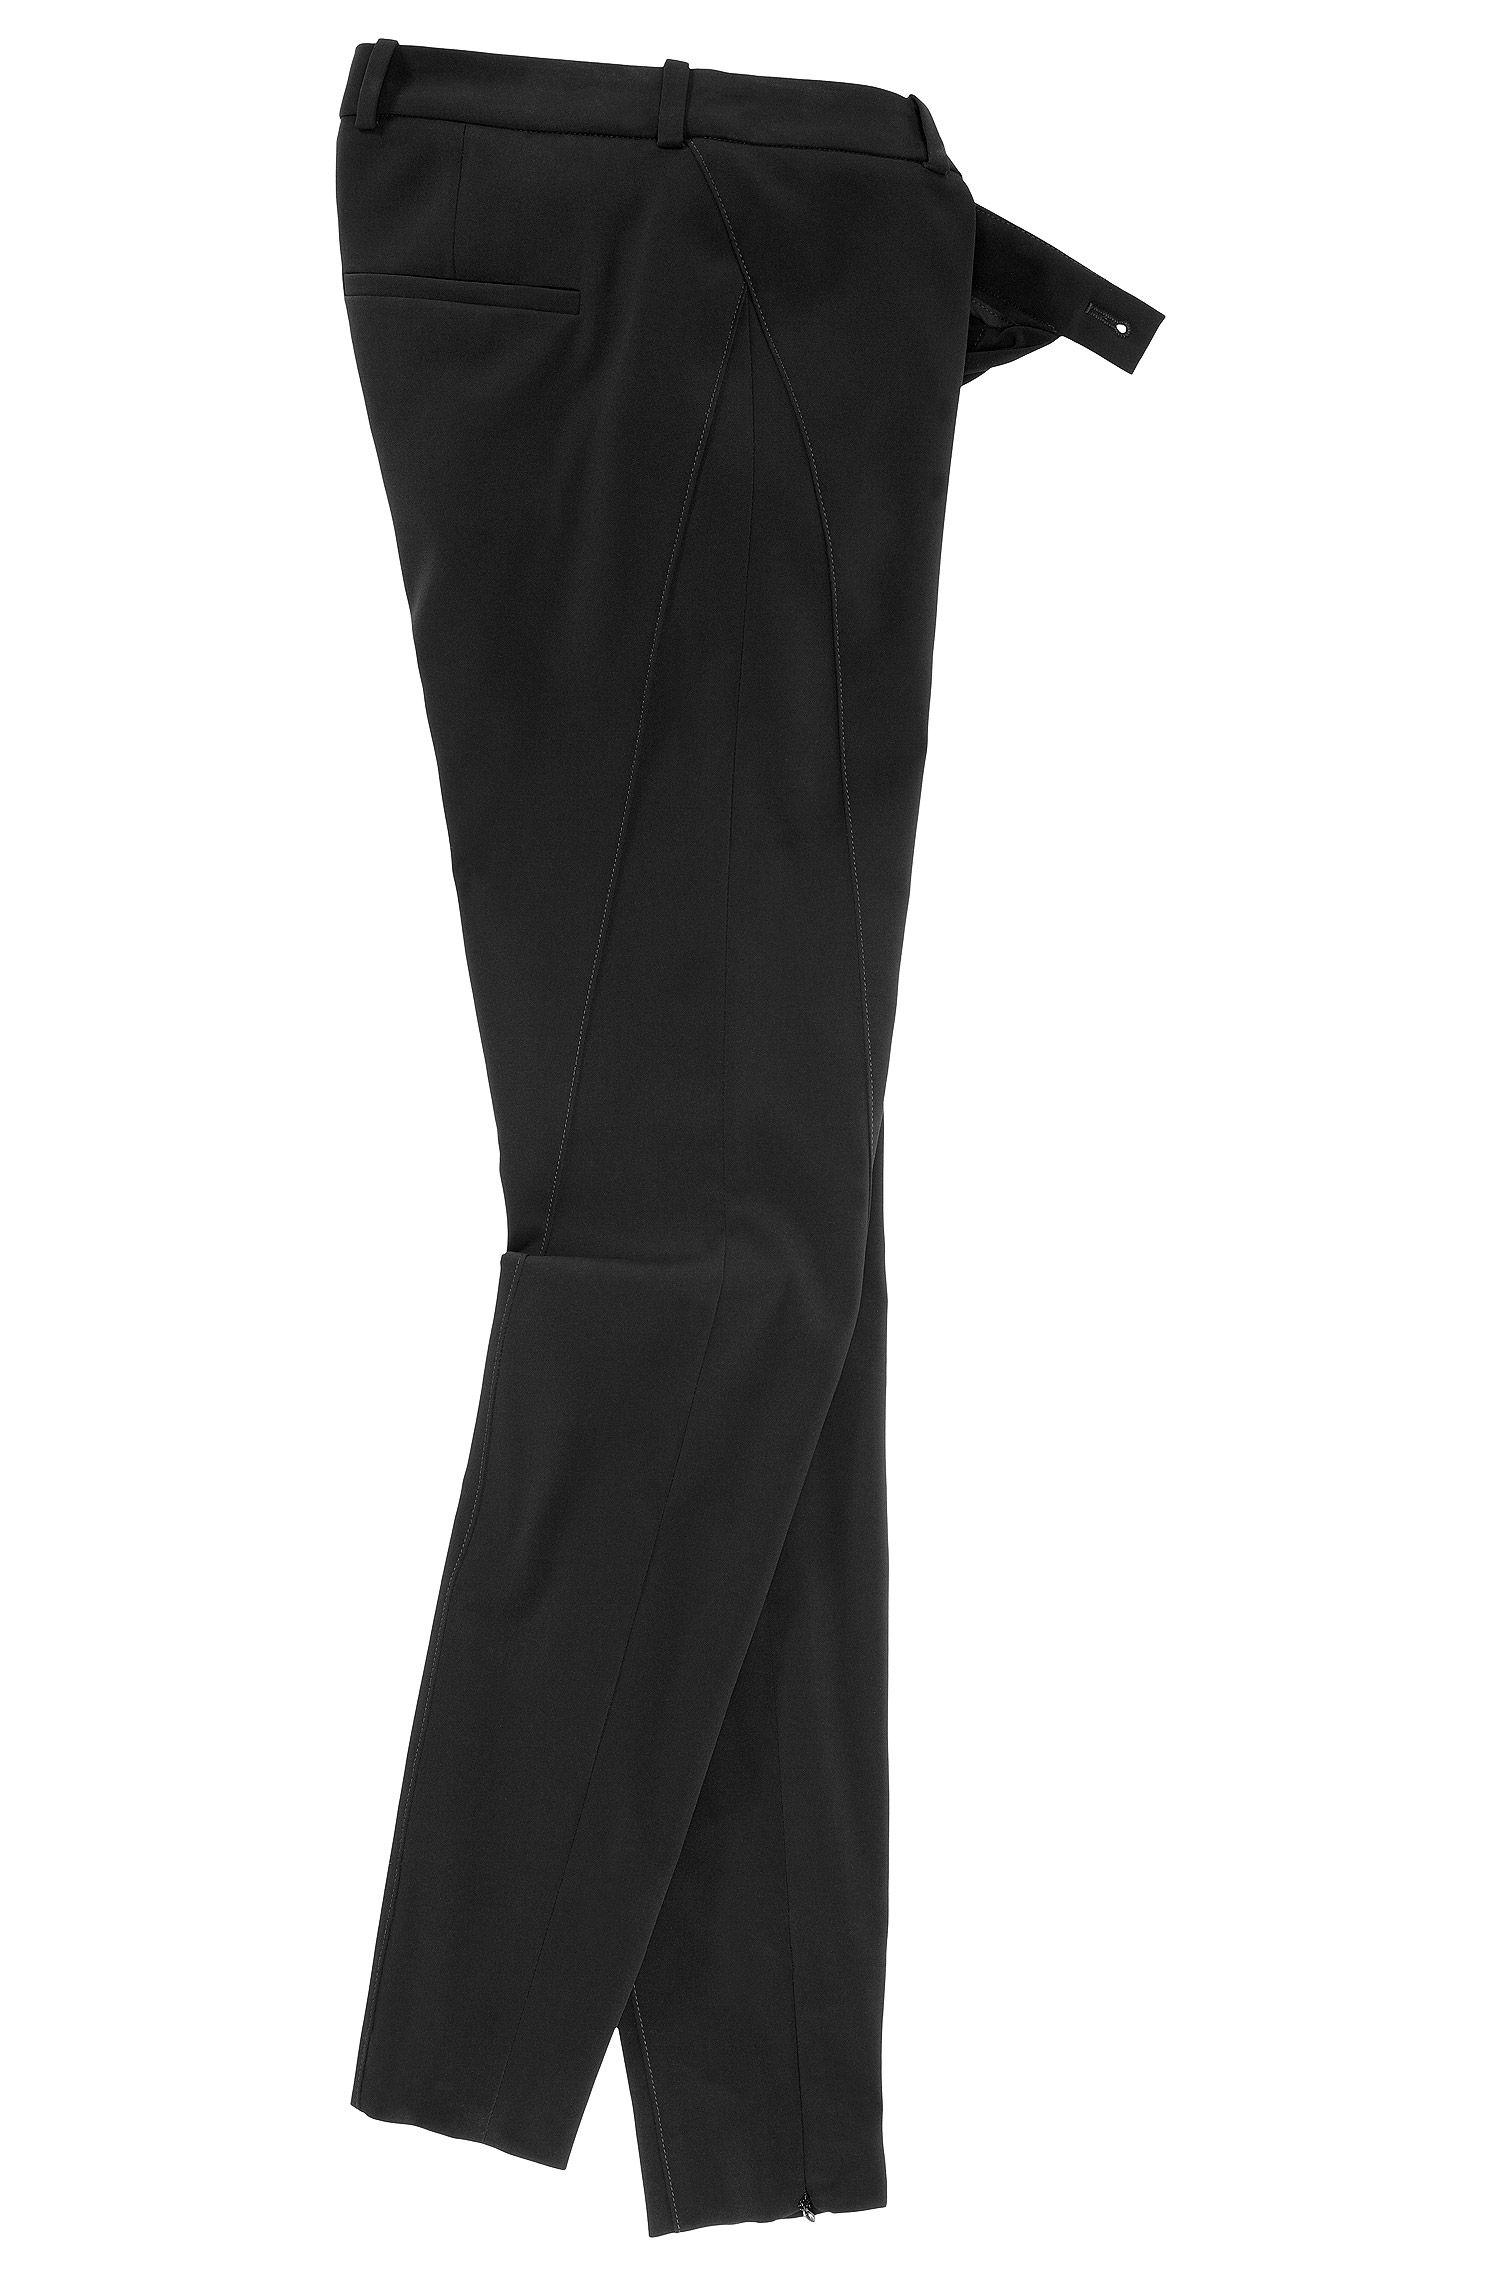 Pantalon Slim Fit en polyester mélangé, Honesta